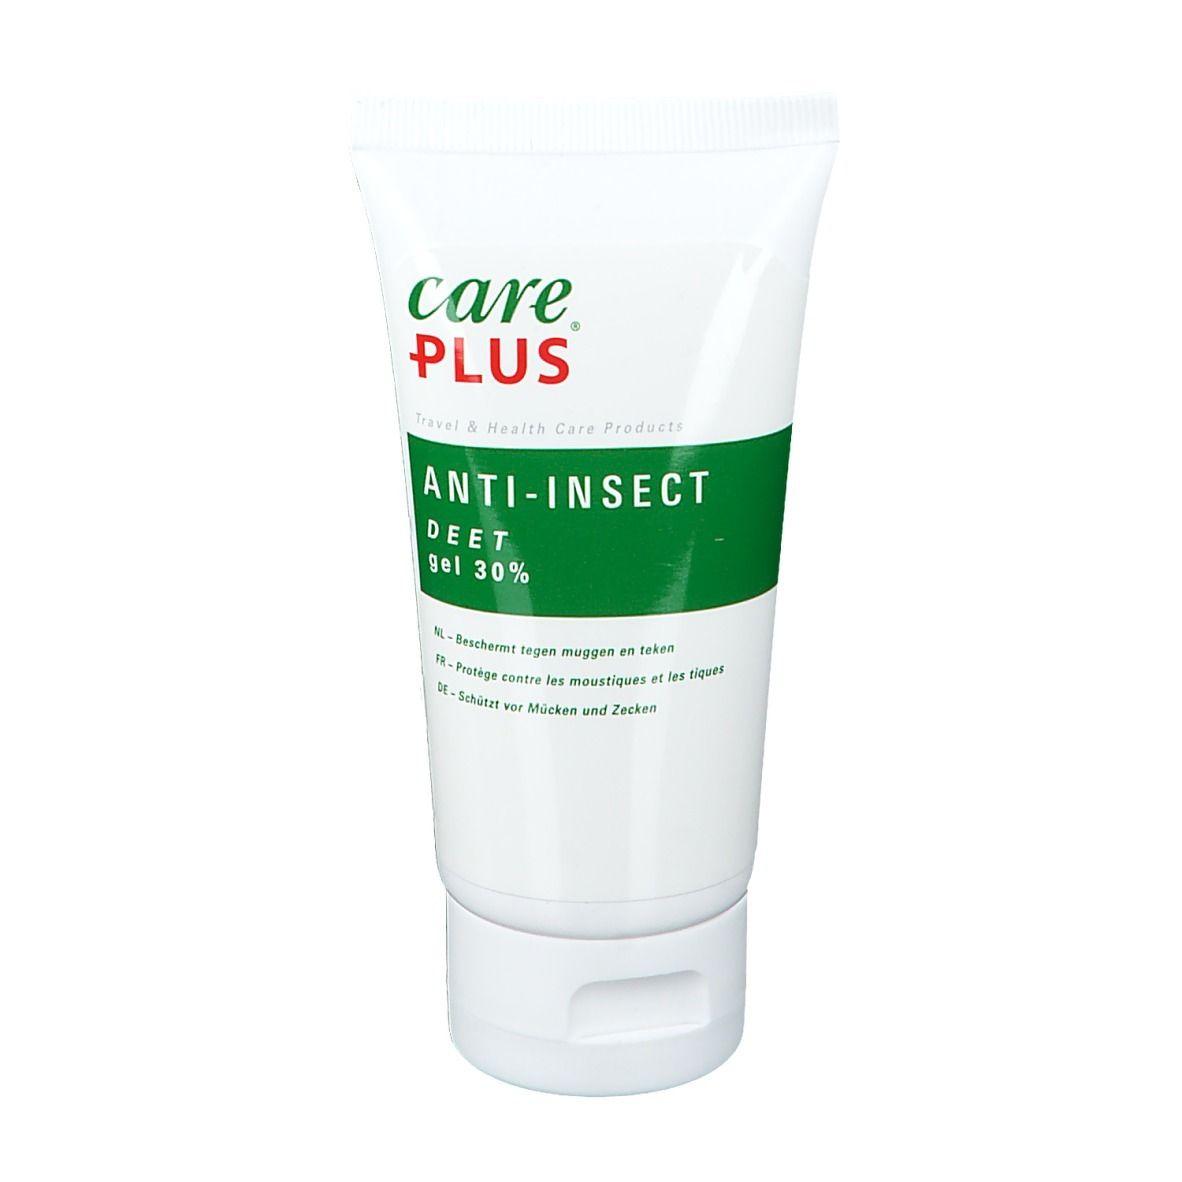 Afbeelding van Care Plus Anti-Insect Gel 30% Deet